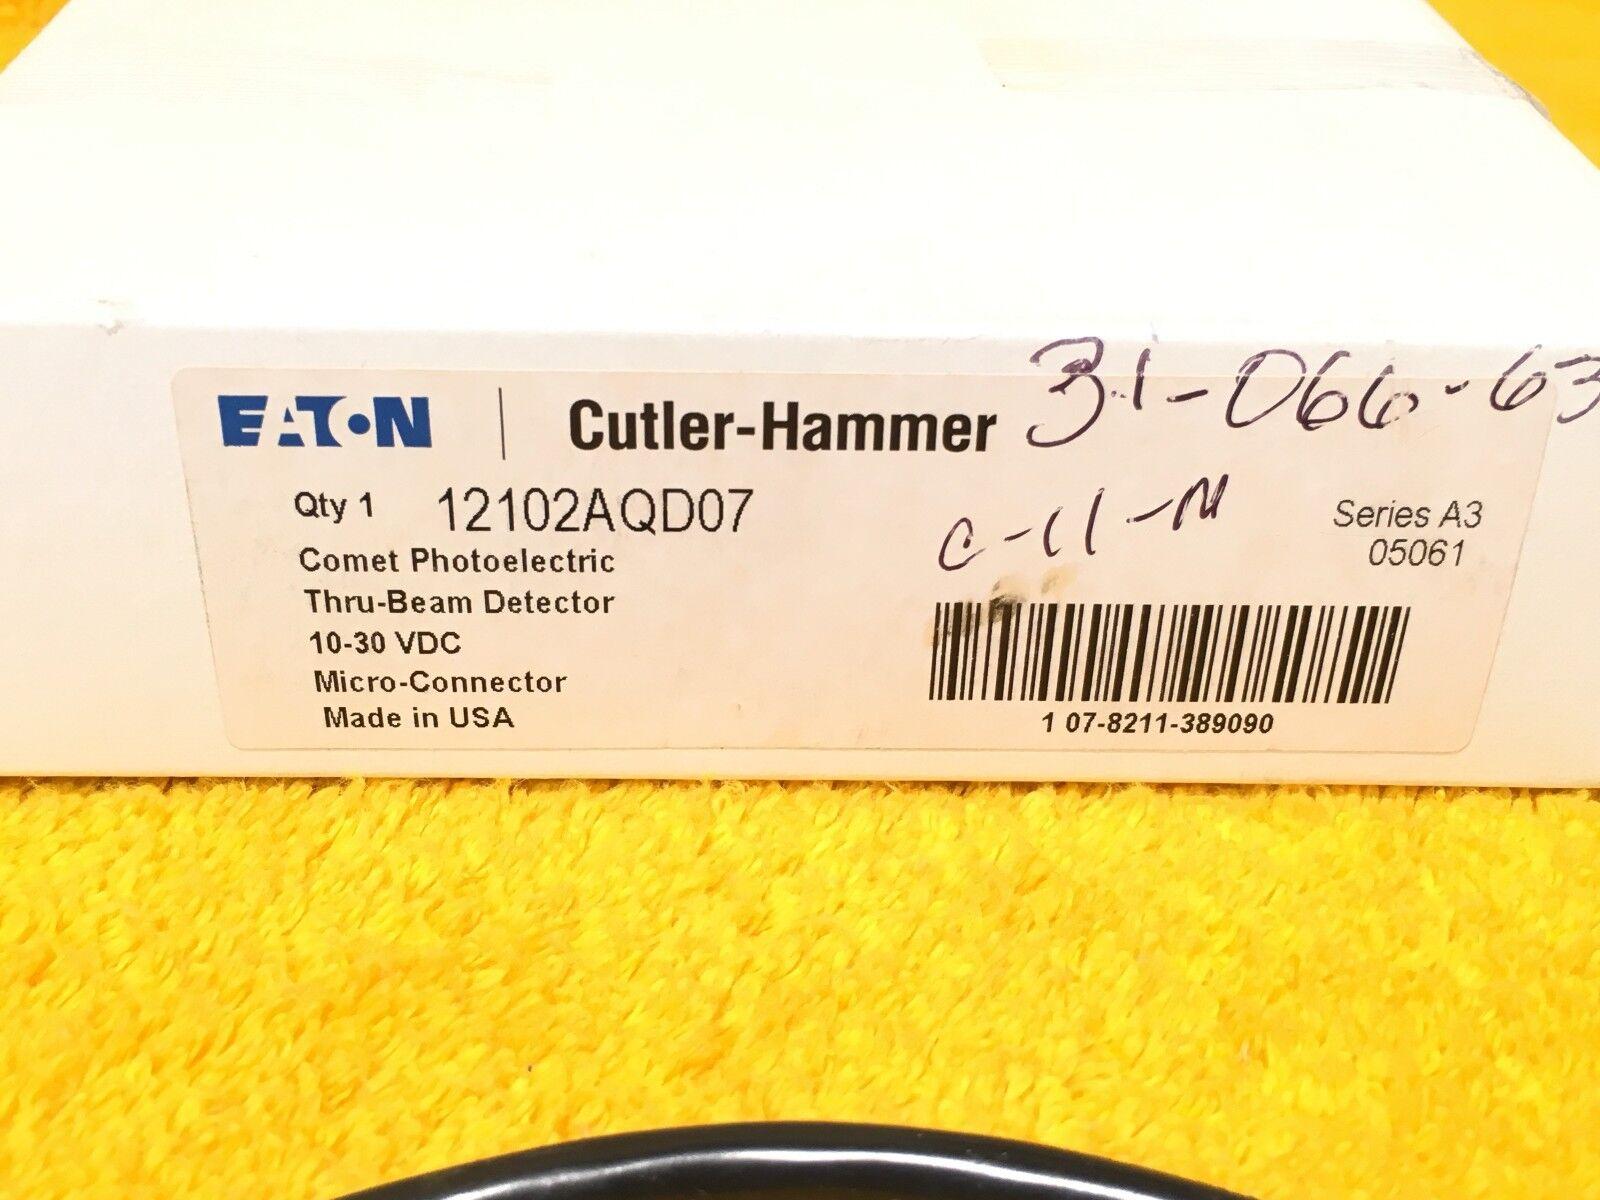 EATON CUTLER-HAMMER 12100RQD07 PHOTOELECTRIC SENSORS QTY 1 NEW IN BOX